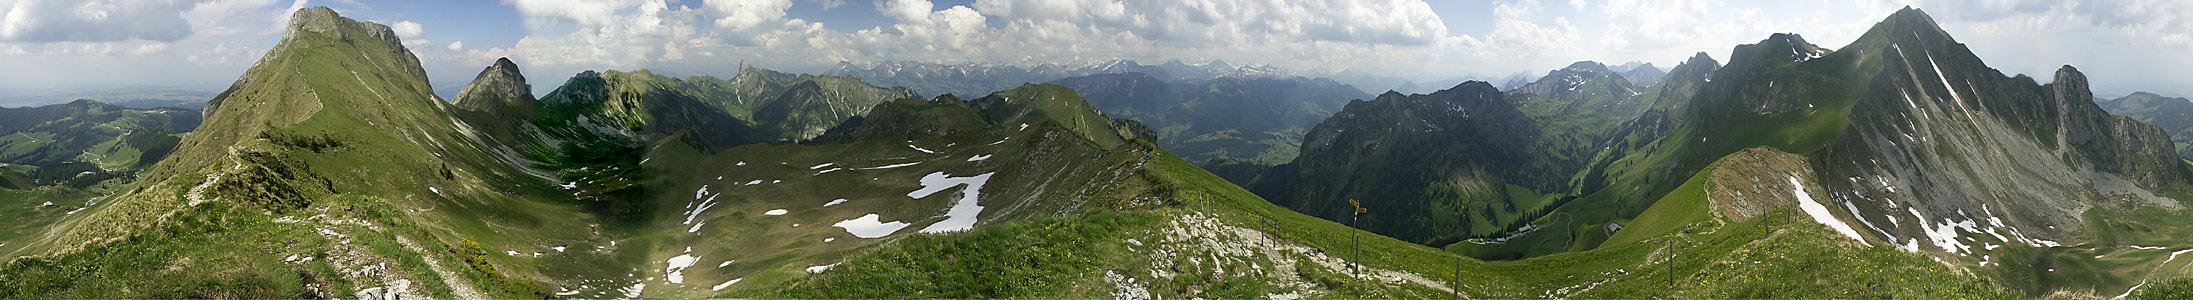 Berner Voralpen-Panorama